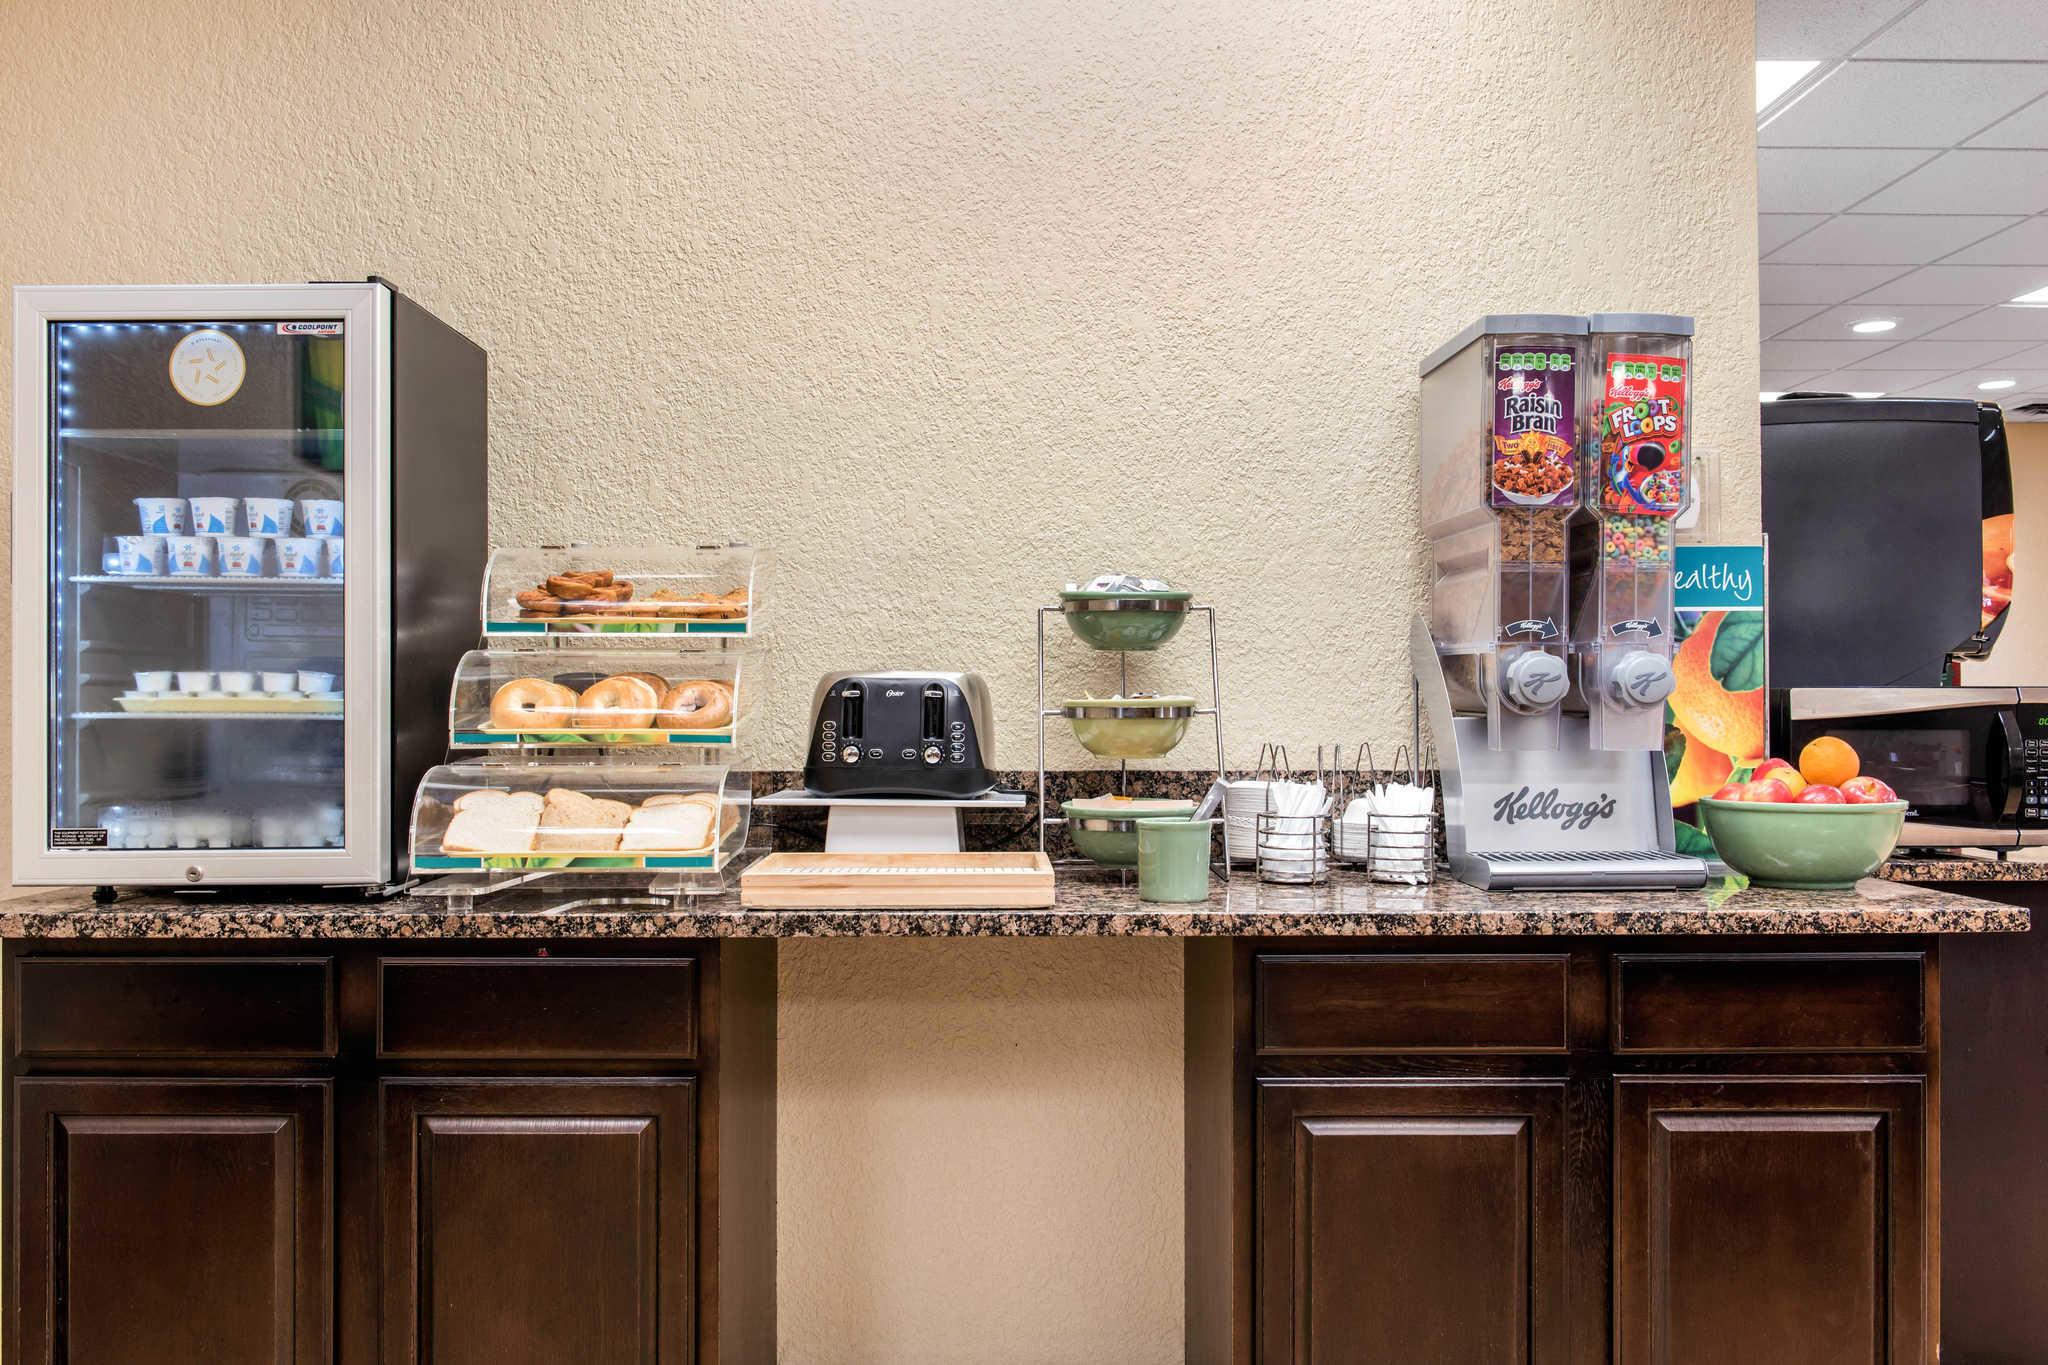 Quality Inn image 32